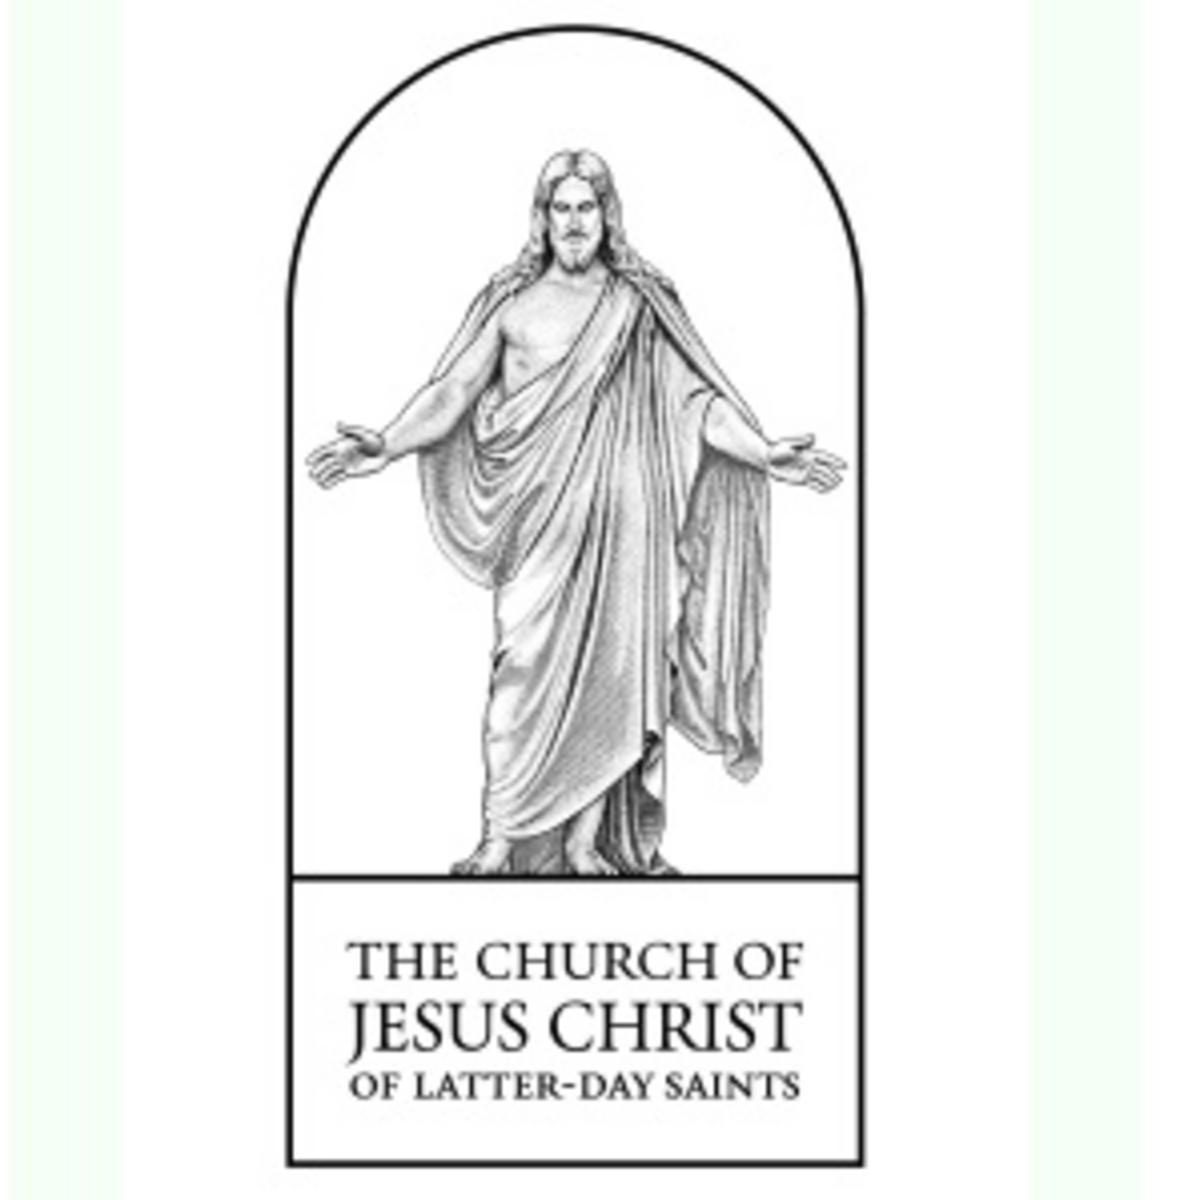 Church of Jesus Christ symbol